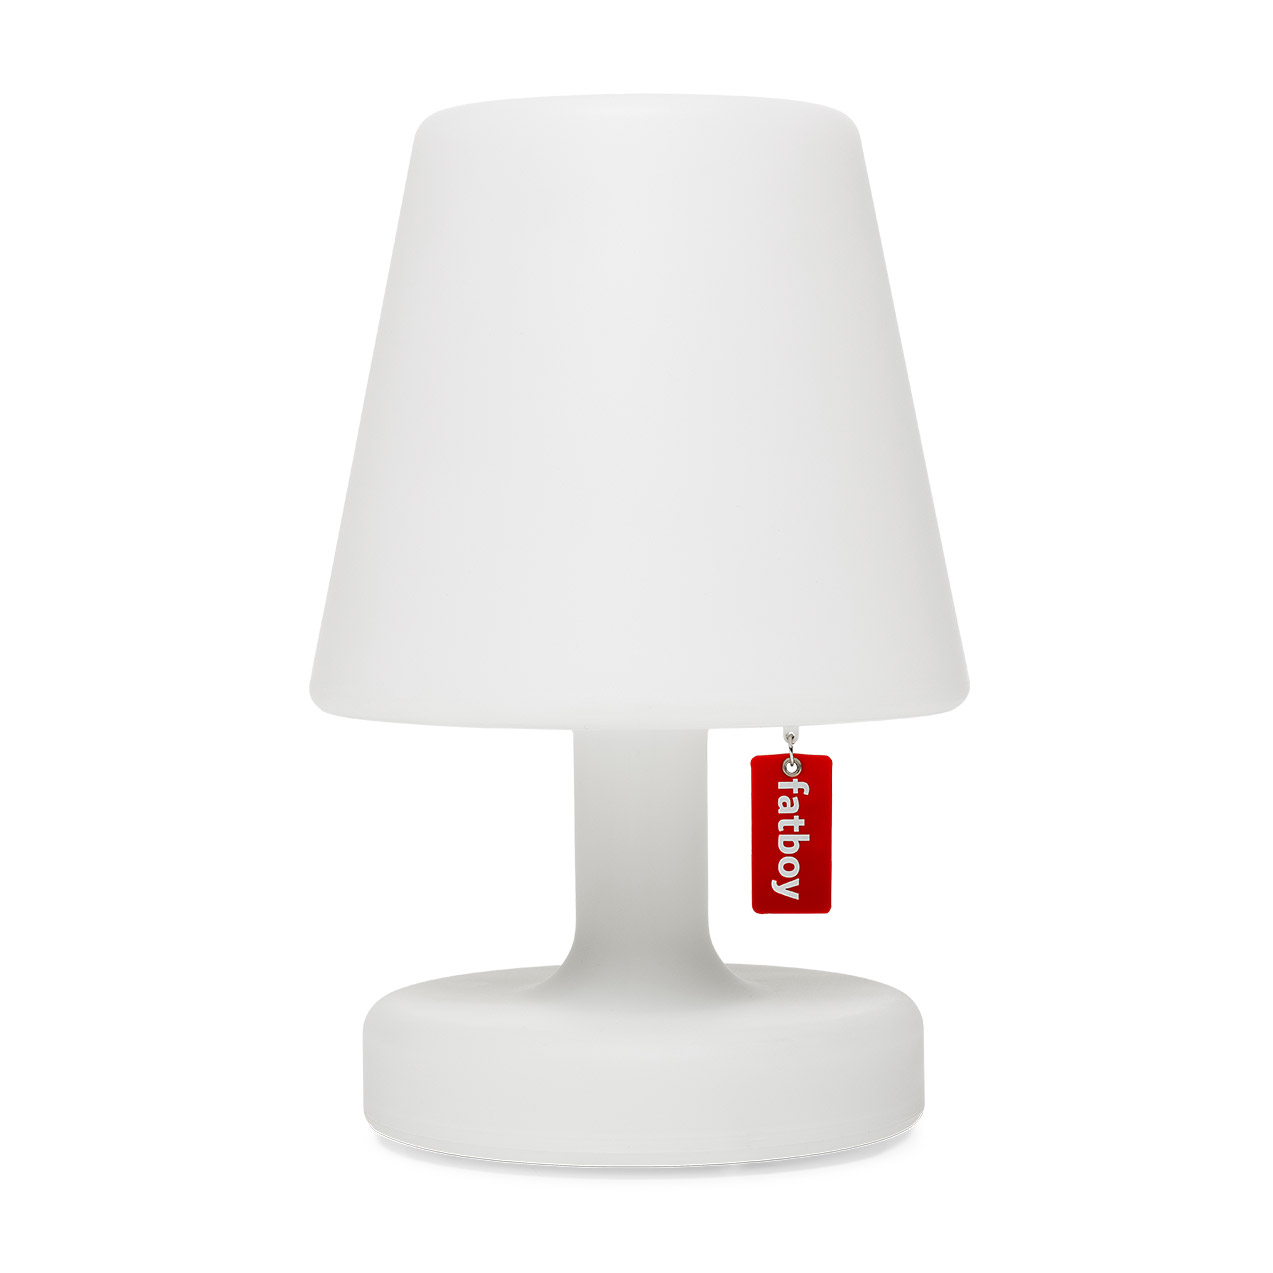 Fatboy lamp Edison 'The Petit'